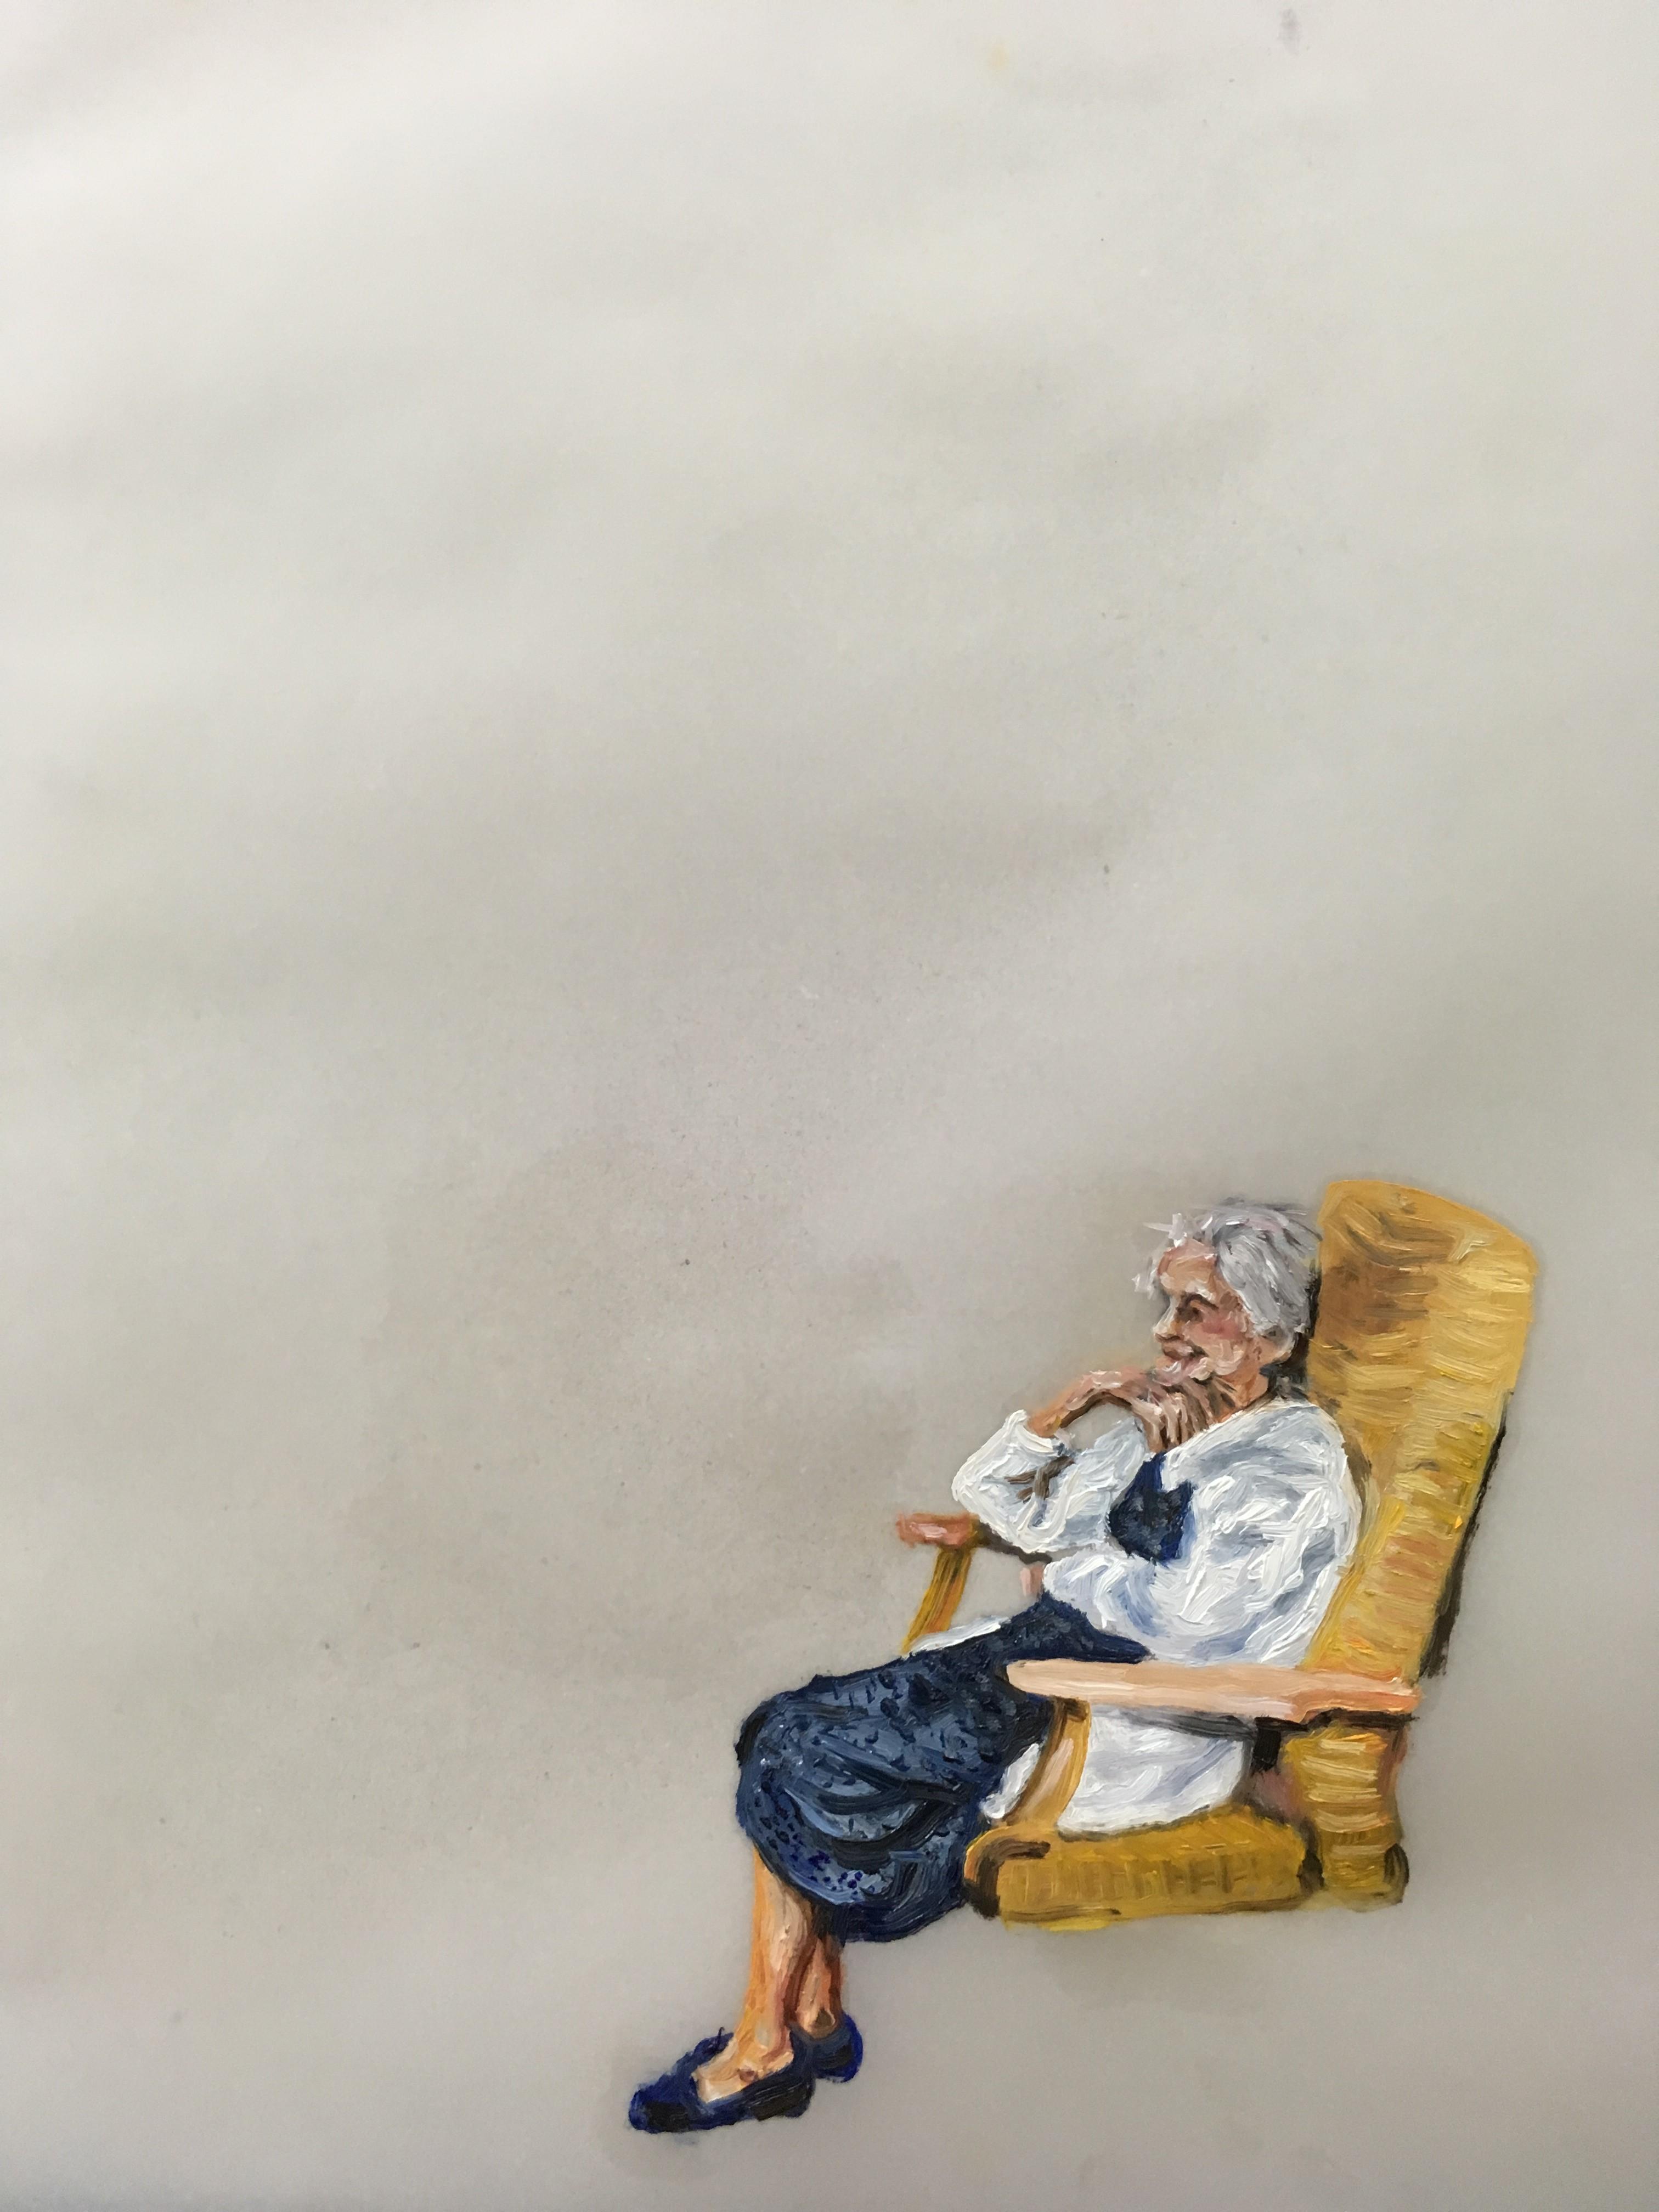 Forgotten Casualty: Elderly